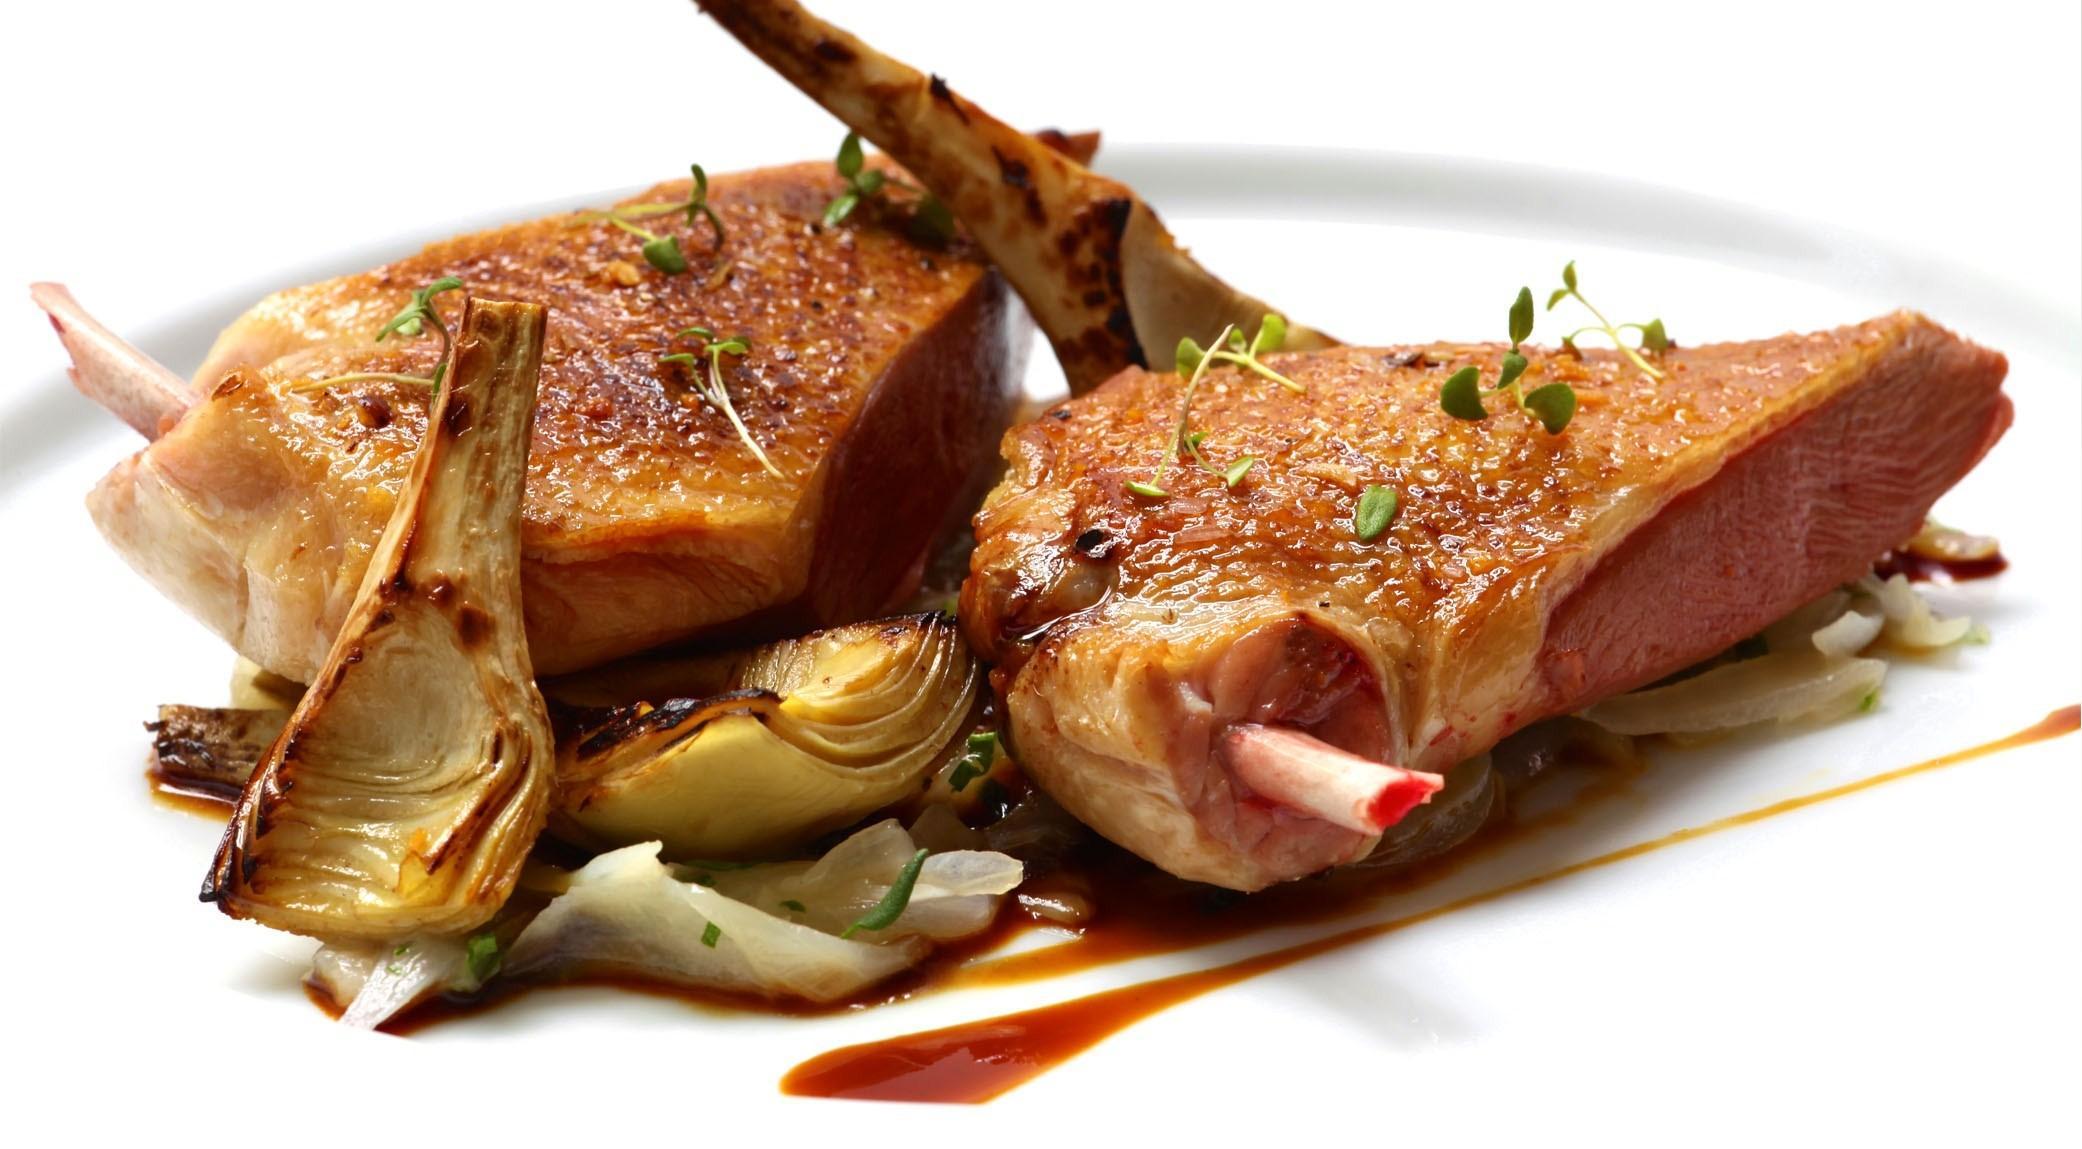 07-50-best-restaurants-lista-2015-dinner-Spiced-Pigeon-finedininglovers